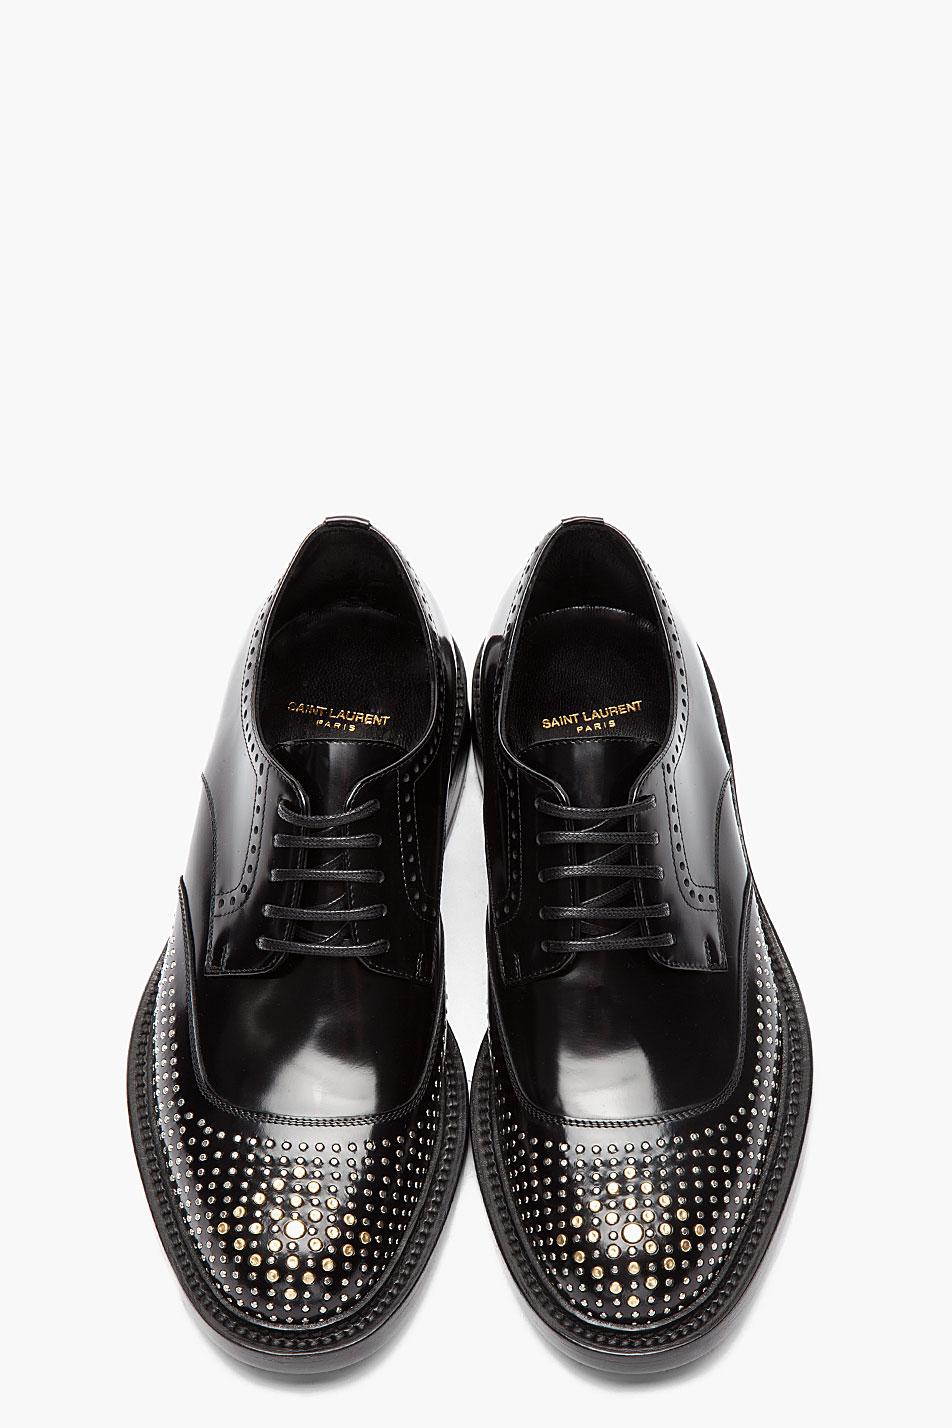 Black Silver Nail Perforated brogues Saint Laurent